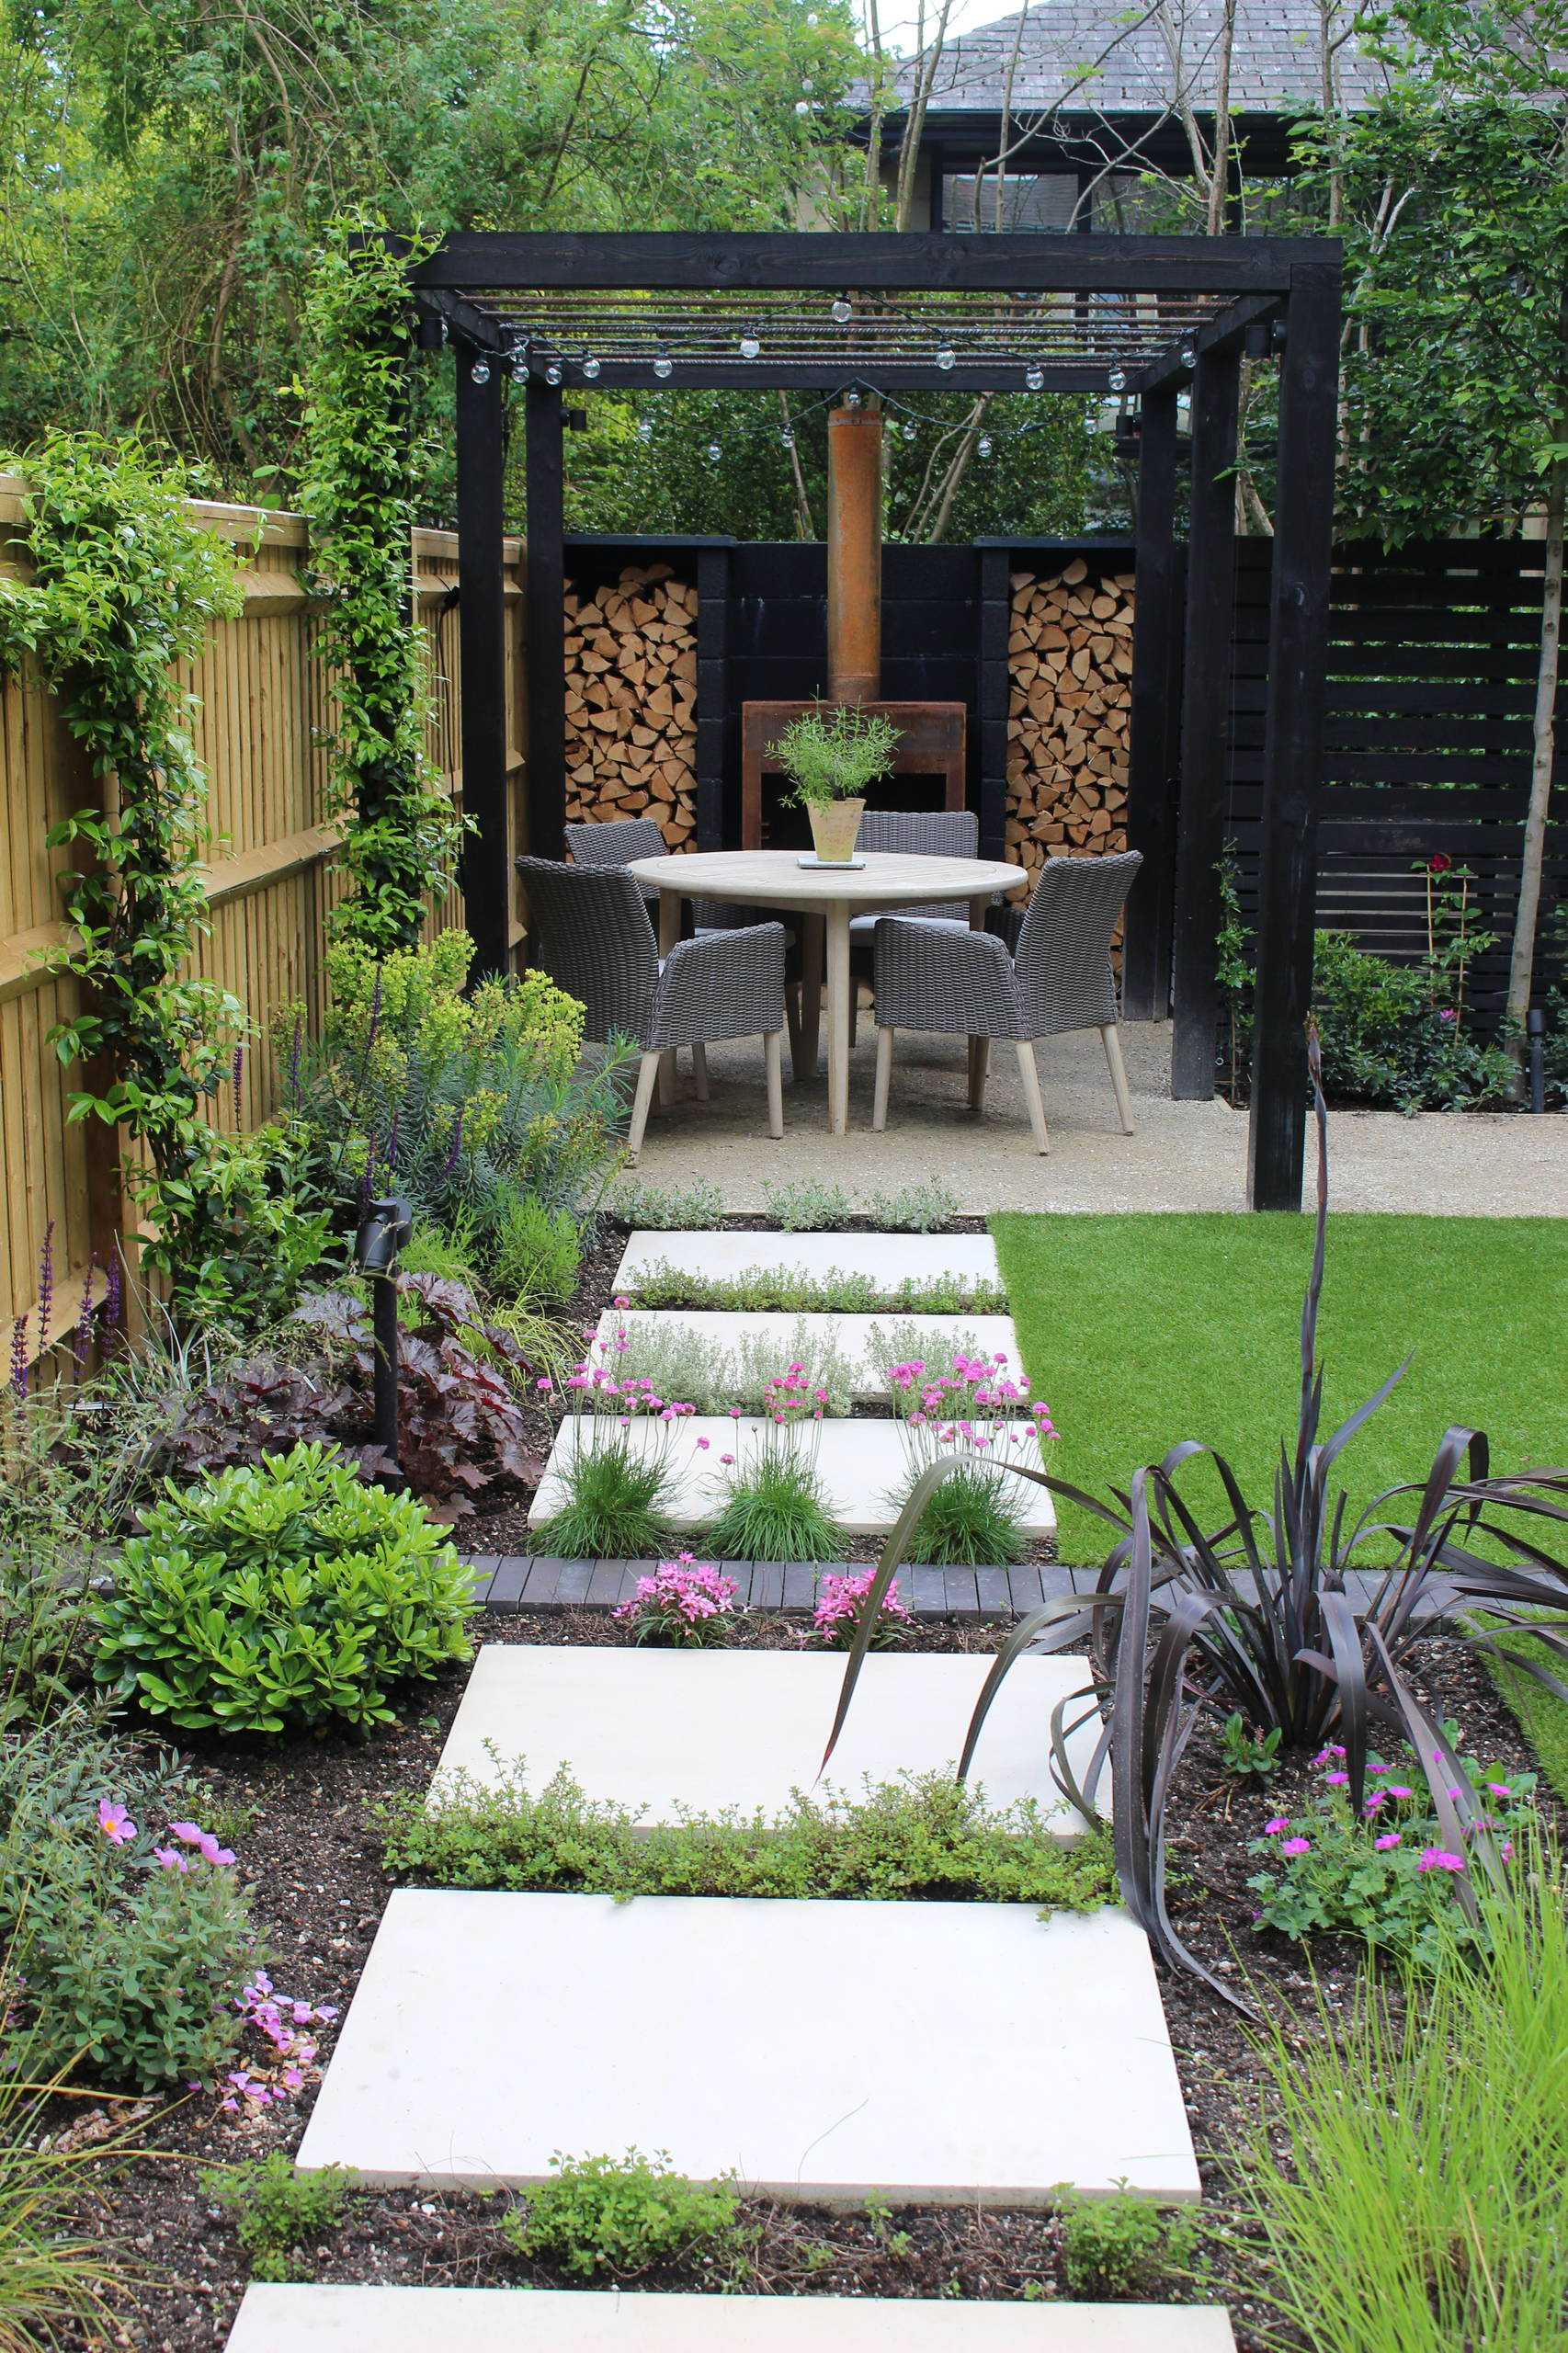 20+ Gärten mit Pergola Ideen & Bilder   September 20   Houzz DE